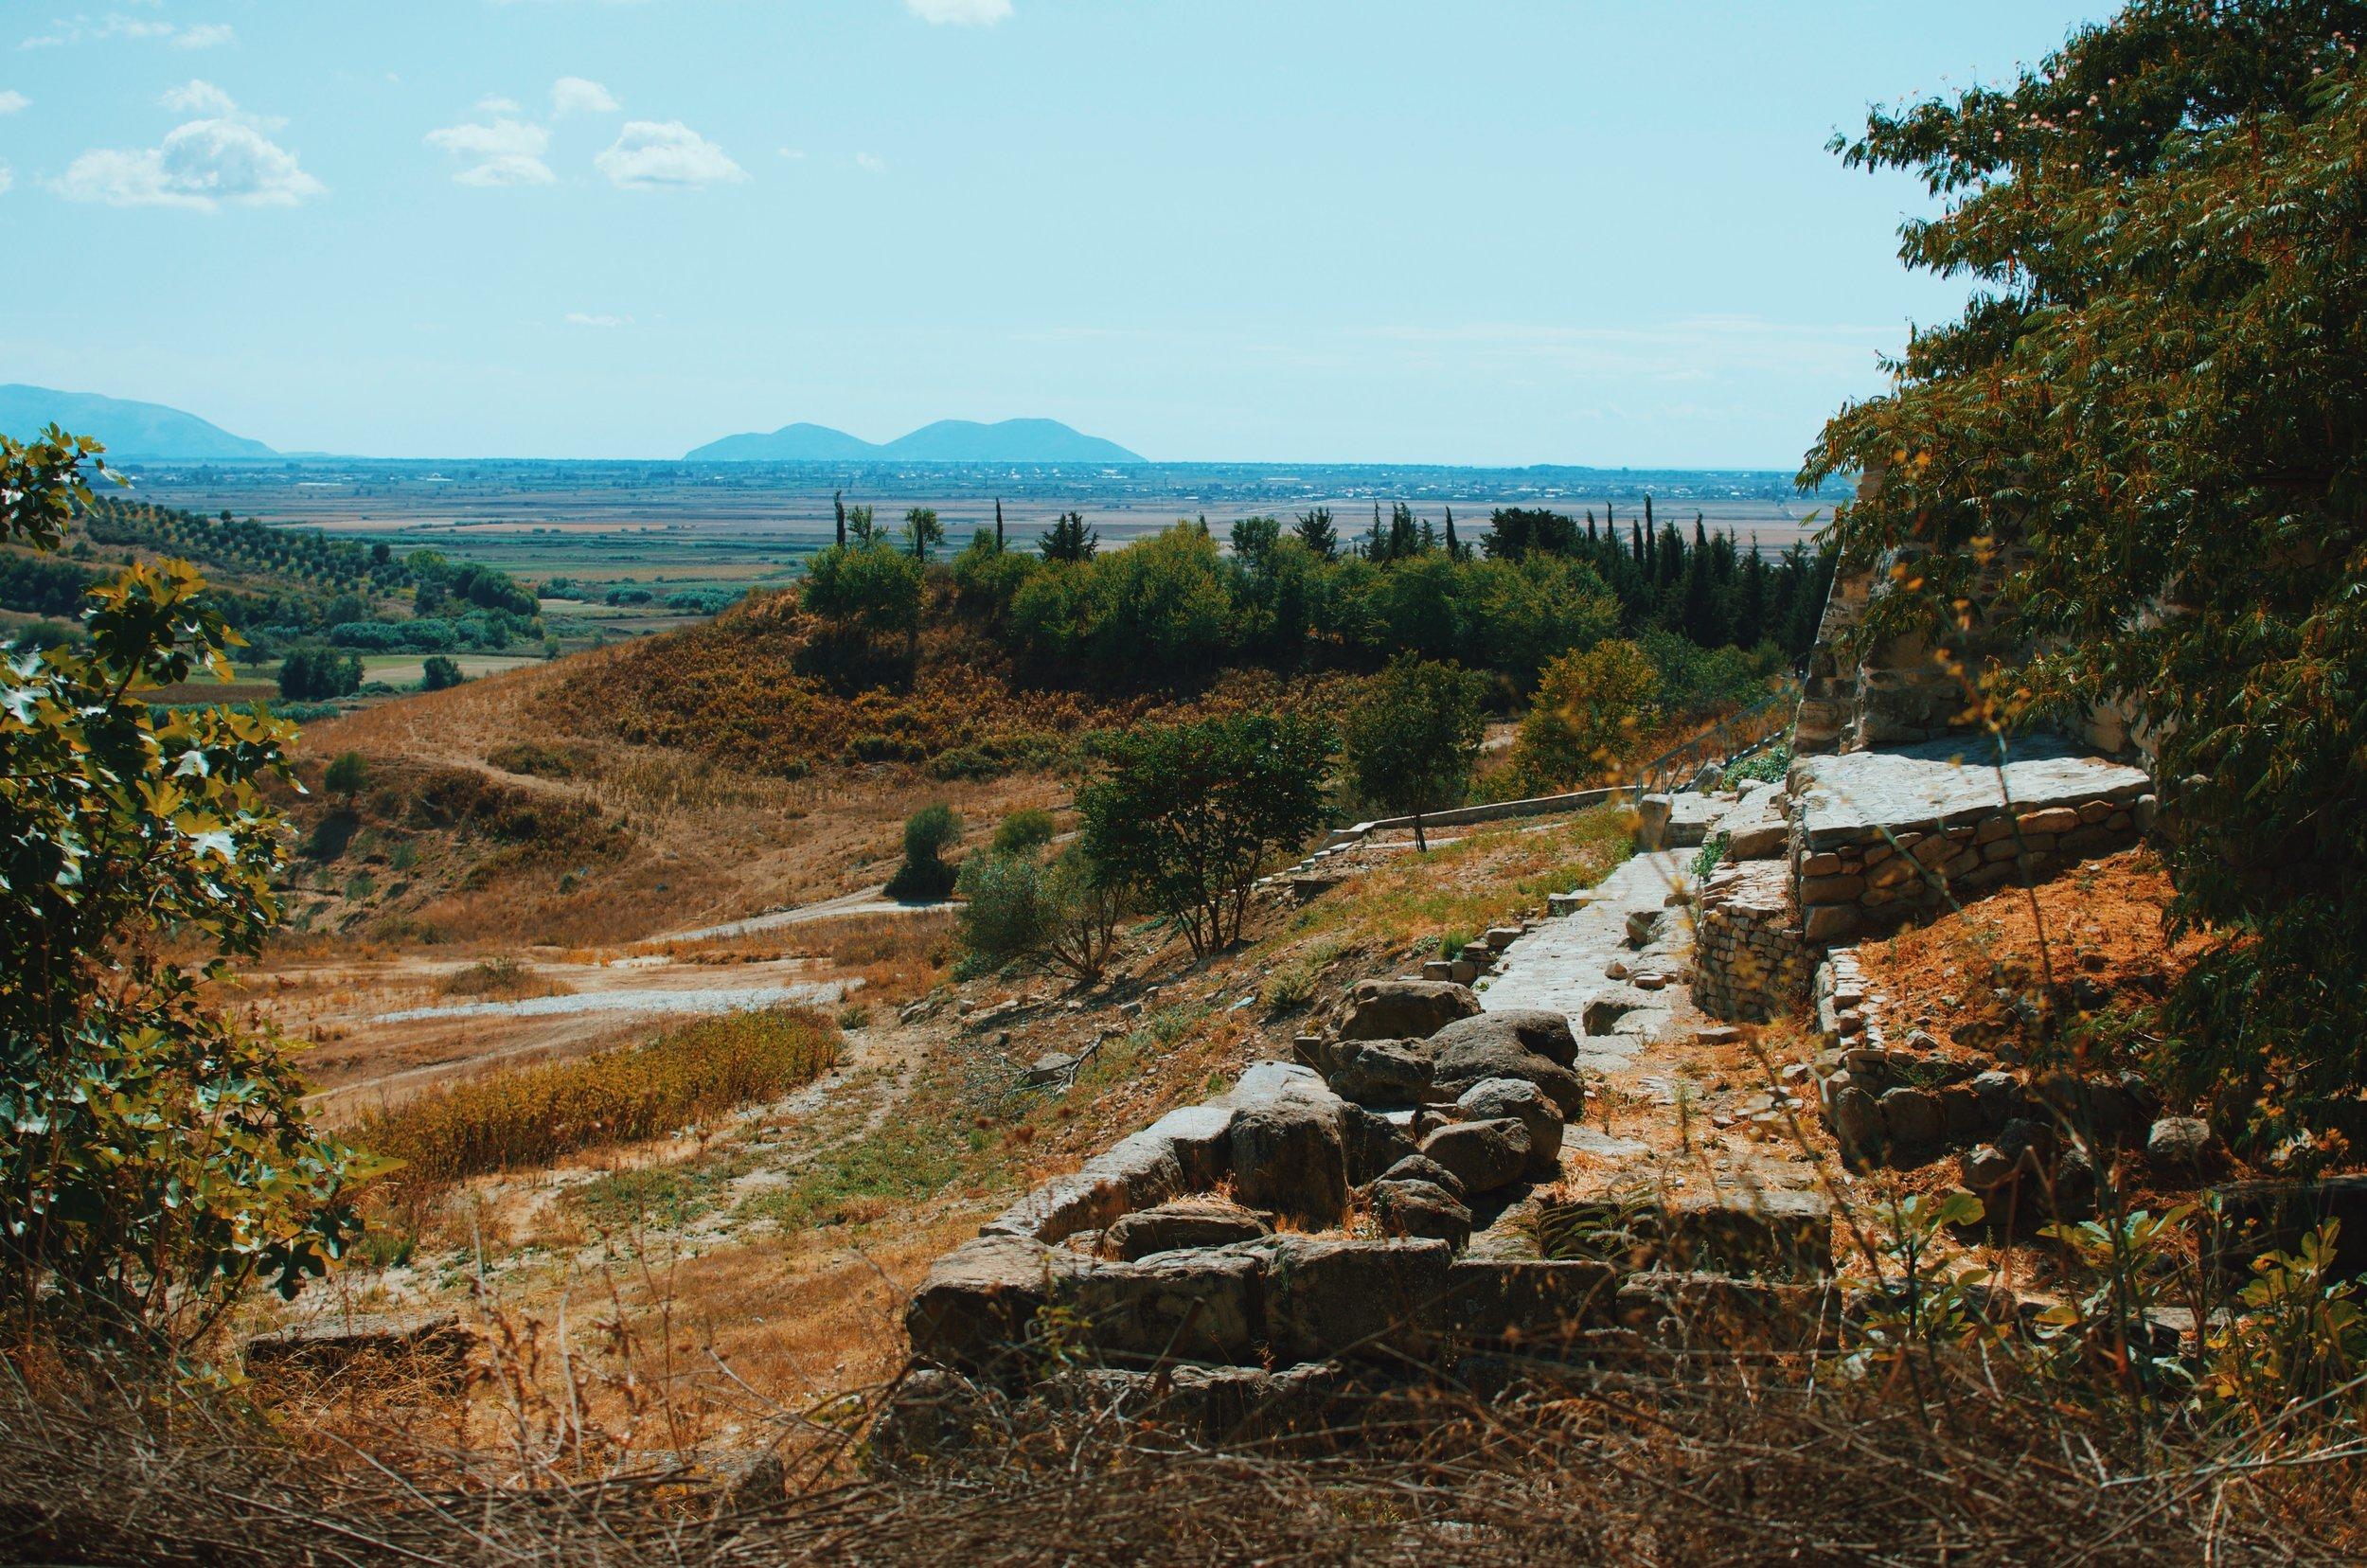 Ruins in Apollonia, Albania